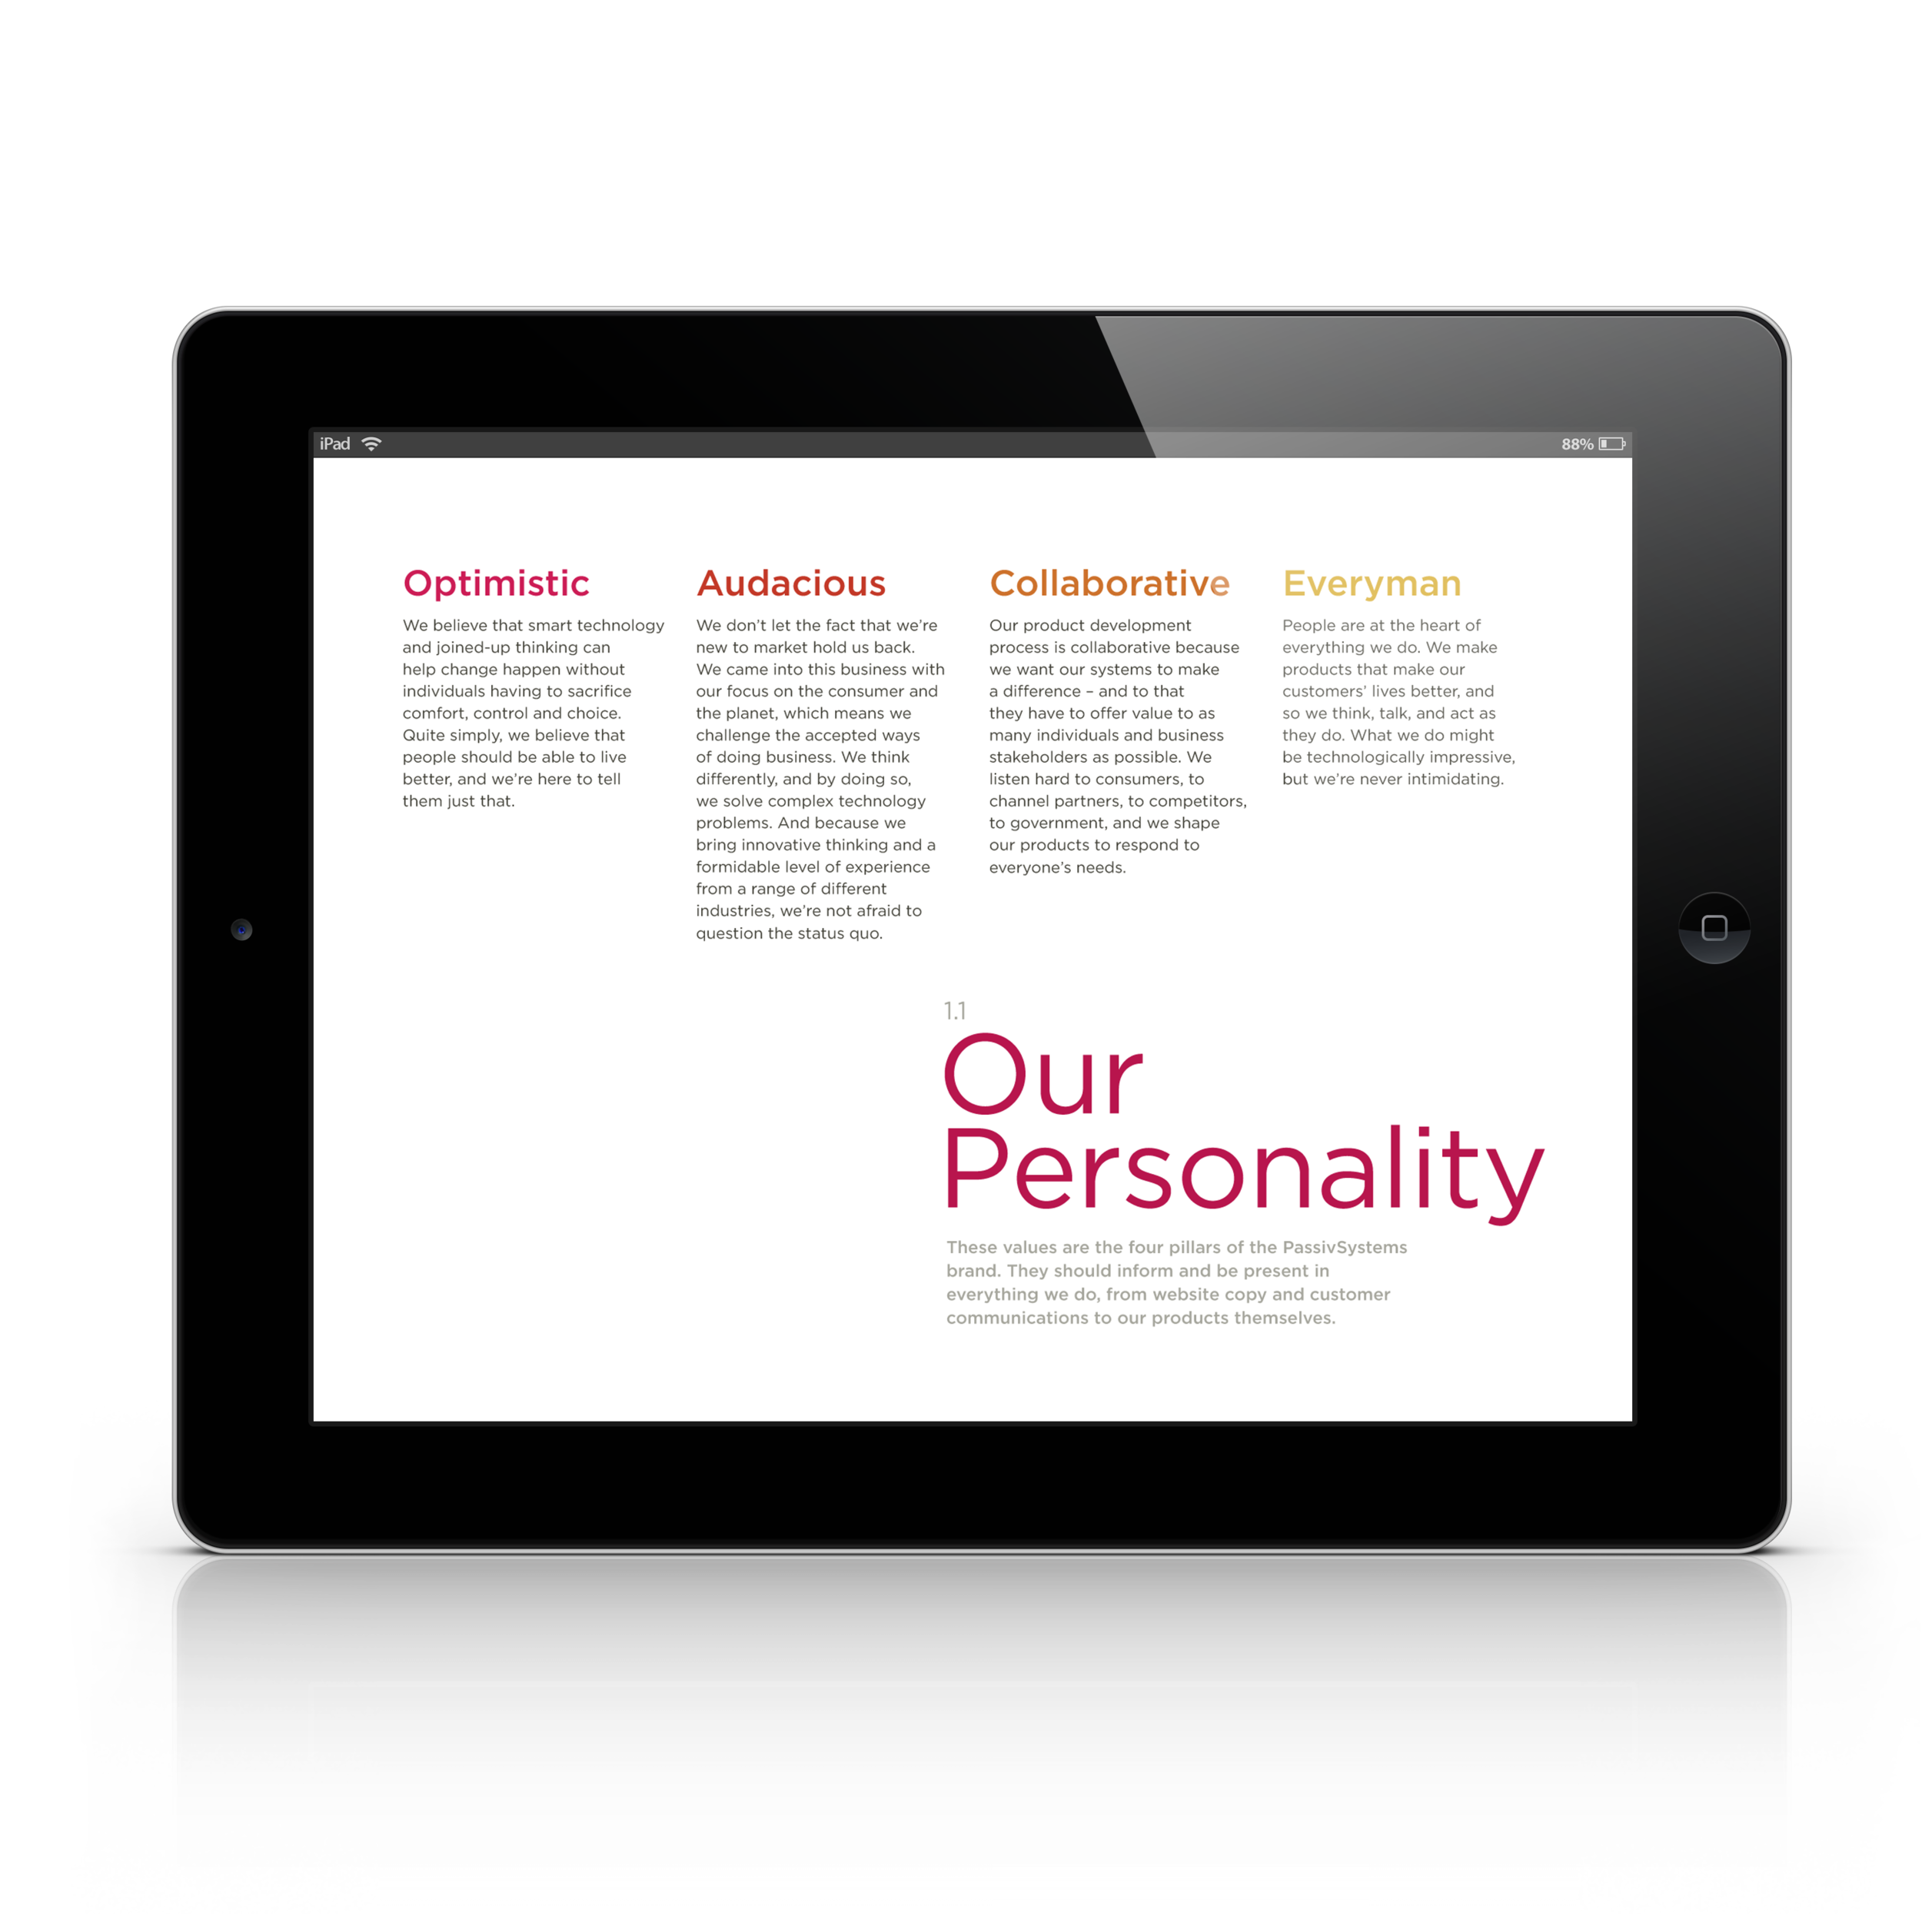 iPad-Landscape-Retina-Display-Mockup3.png